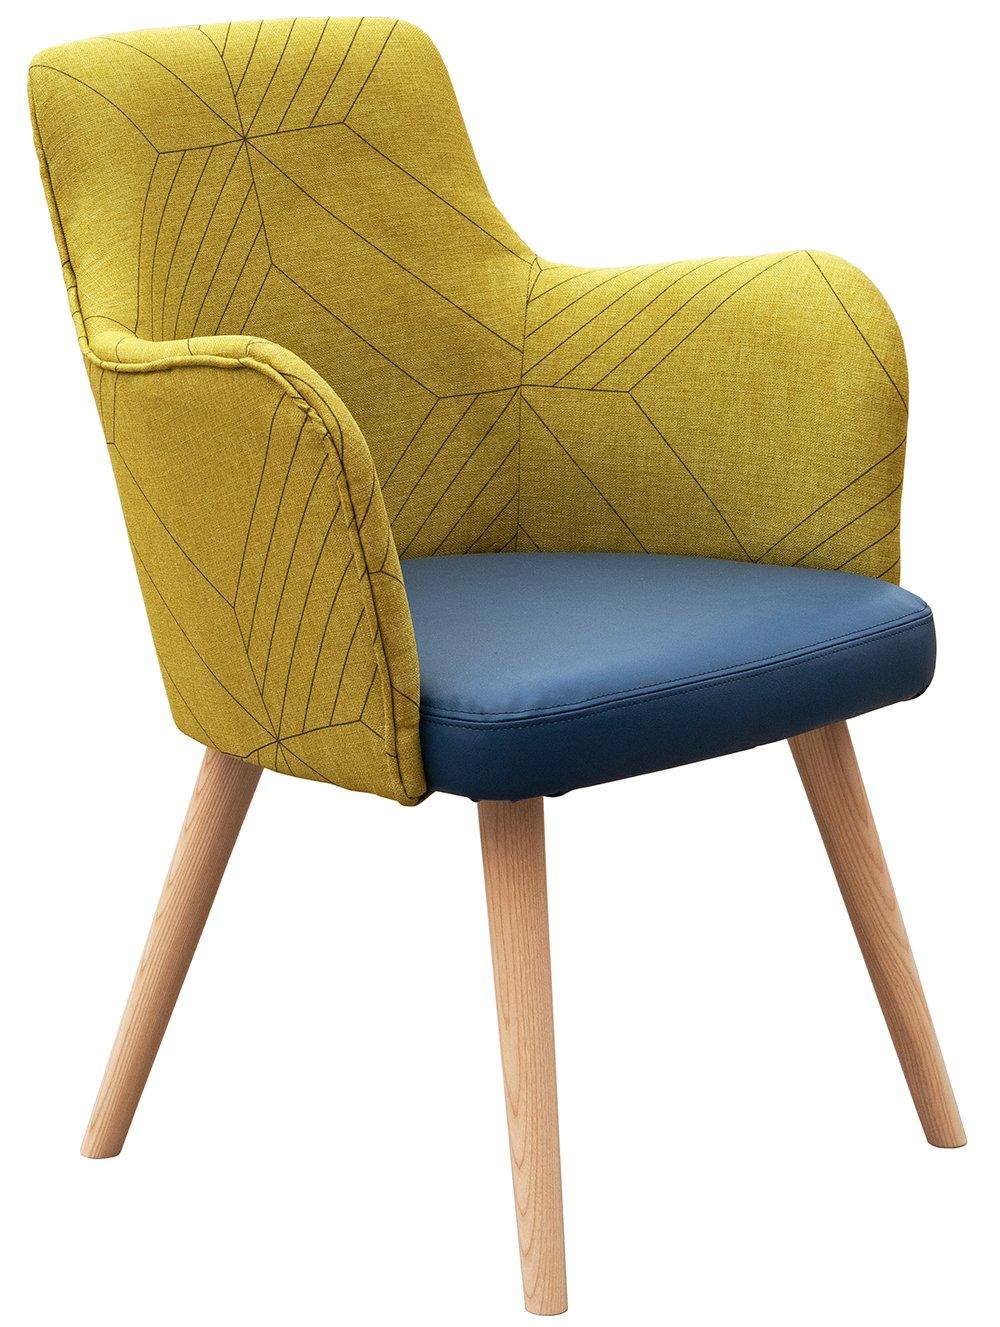 camden armchair